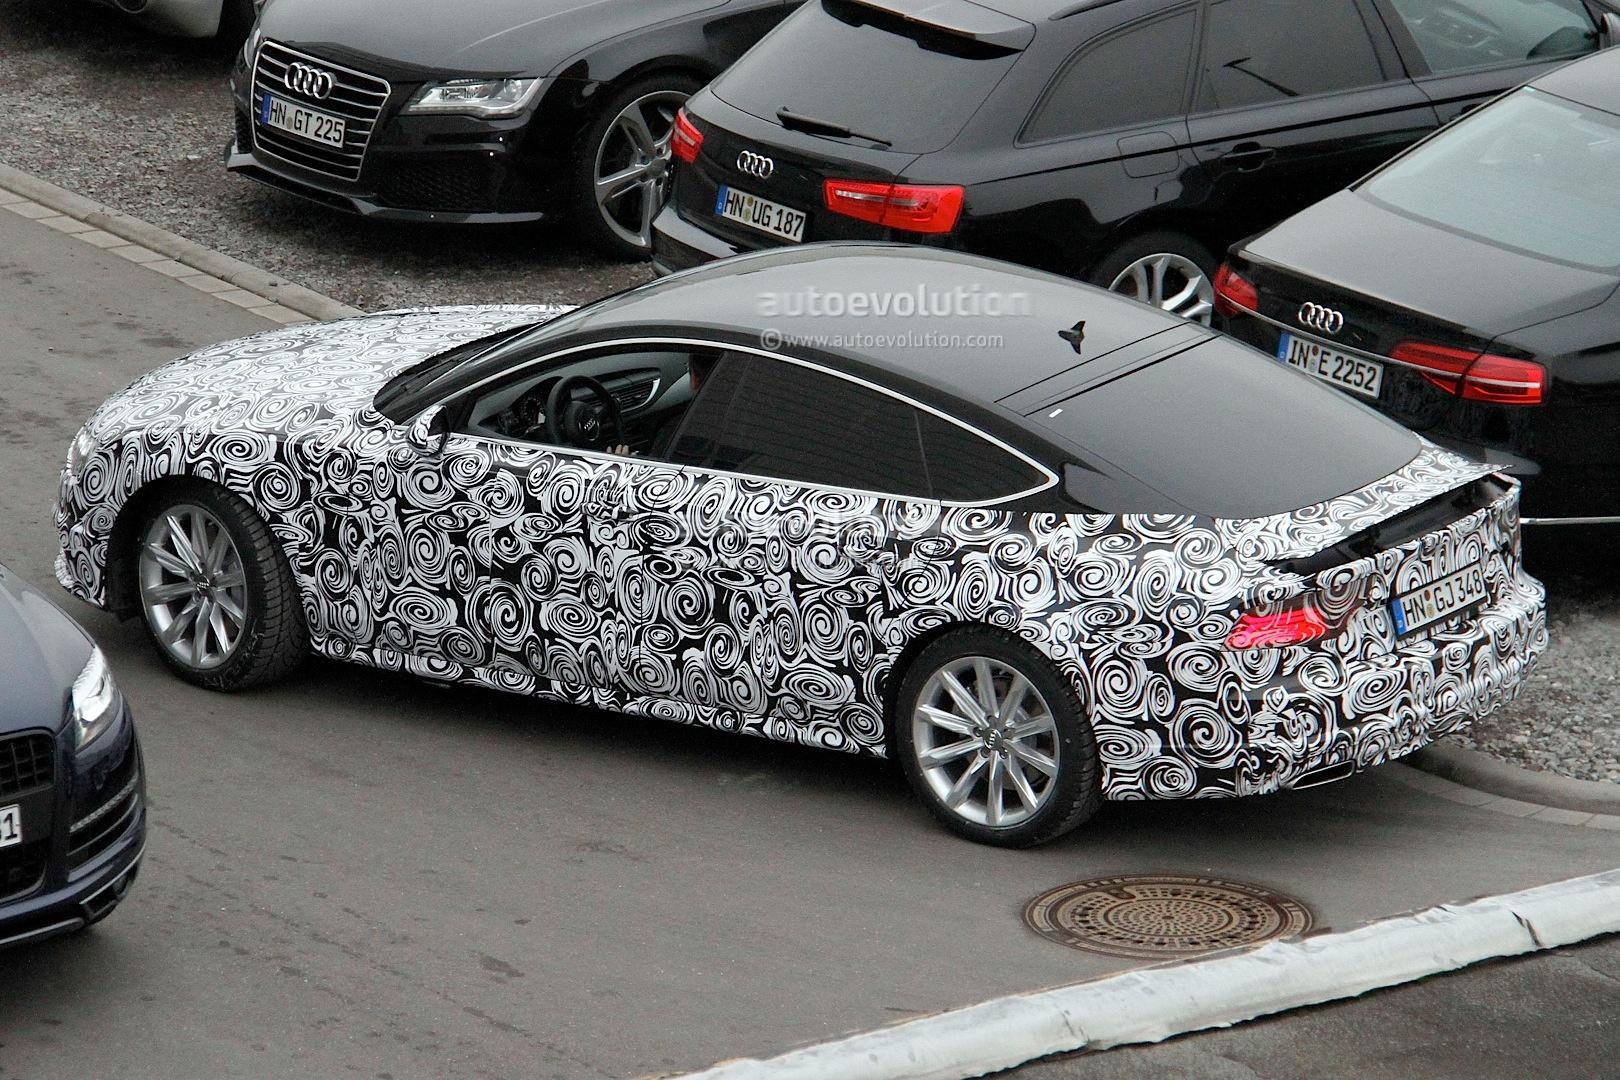 2014 - [Audi] A7 & S7 Sportback Restylée Spyshots-audi-a7-facelift-gets-new-headlight-design-1080p-4